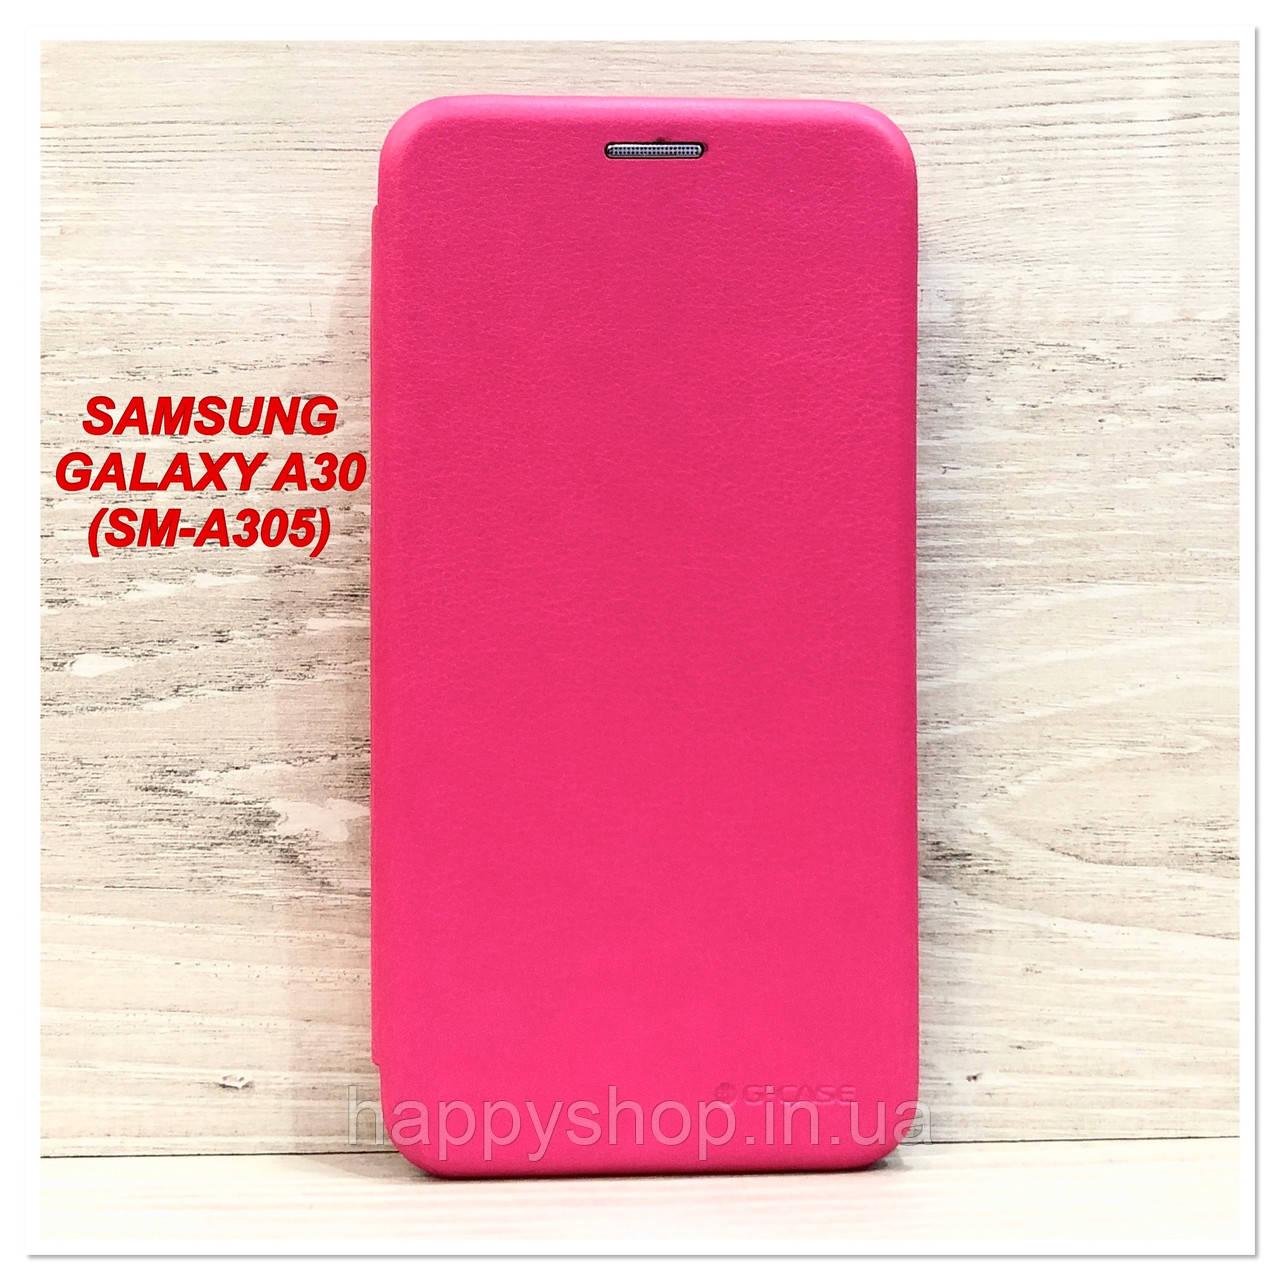 Чохол-книжка G-Case для Samsung Galaxy A30 (SM-A305) Рожевий